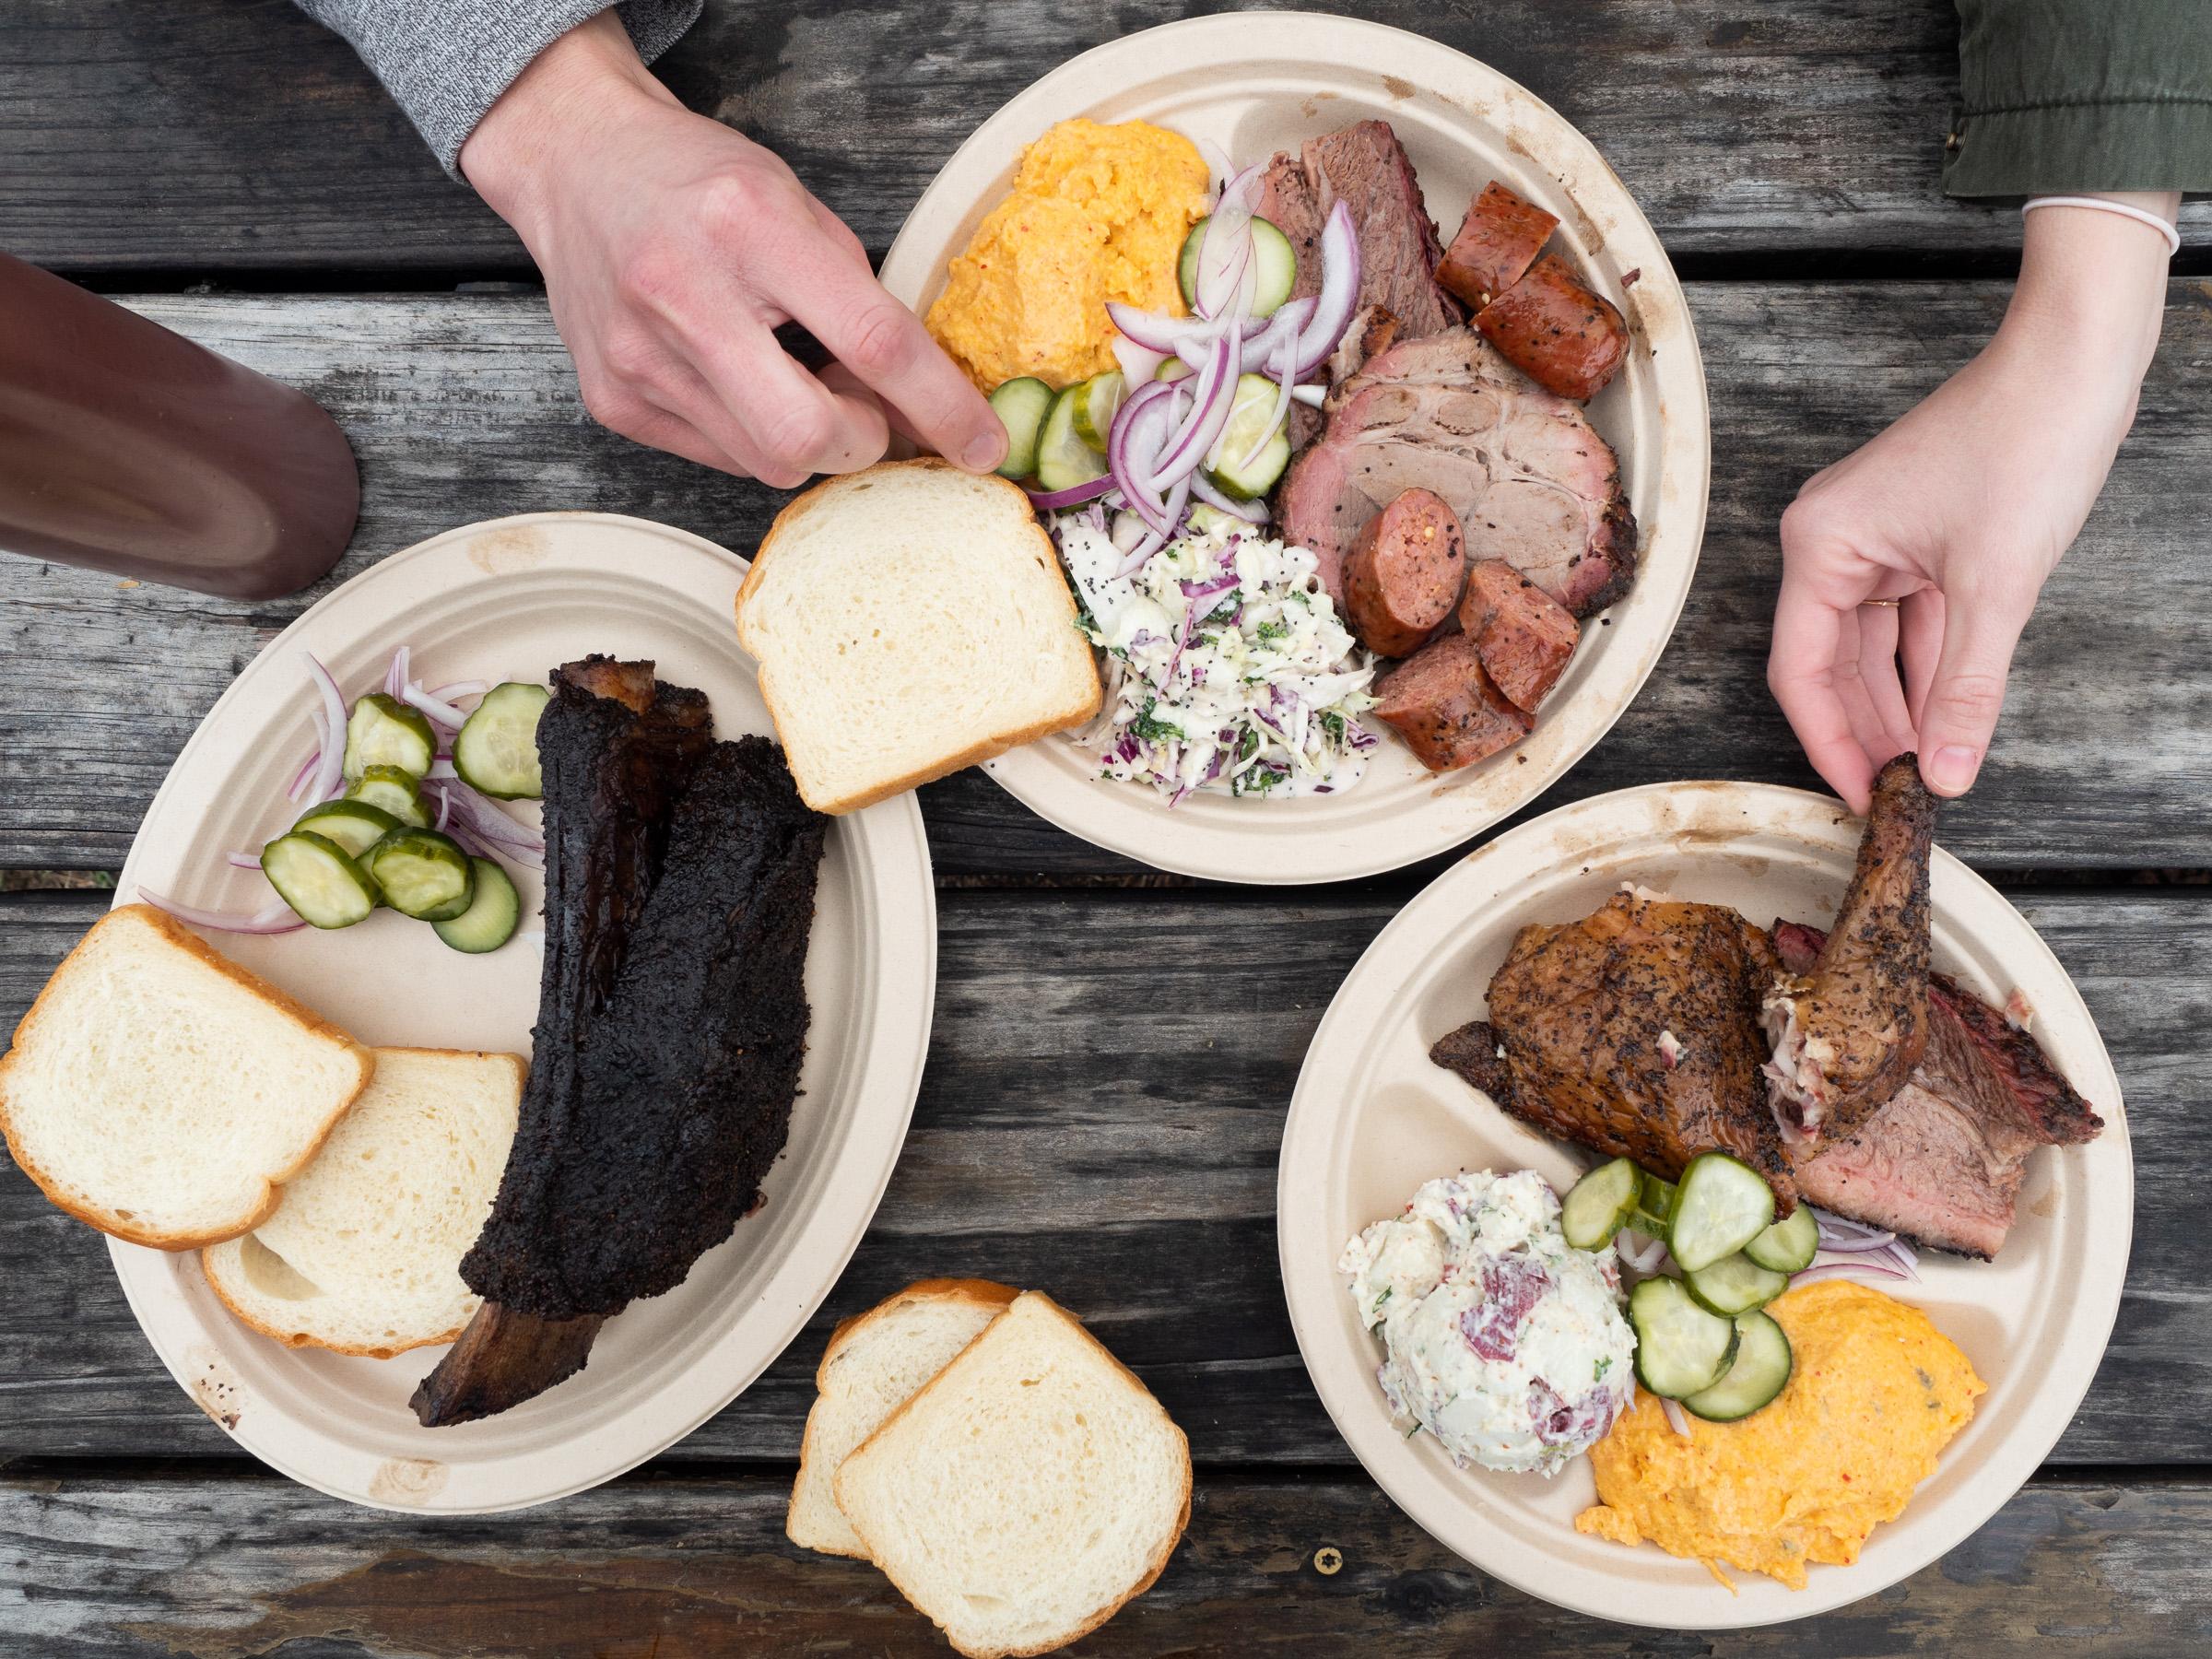 travel channel austin texas food photographer portland oregon micklthewait